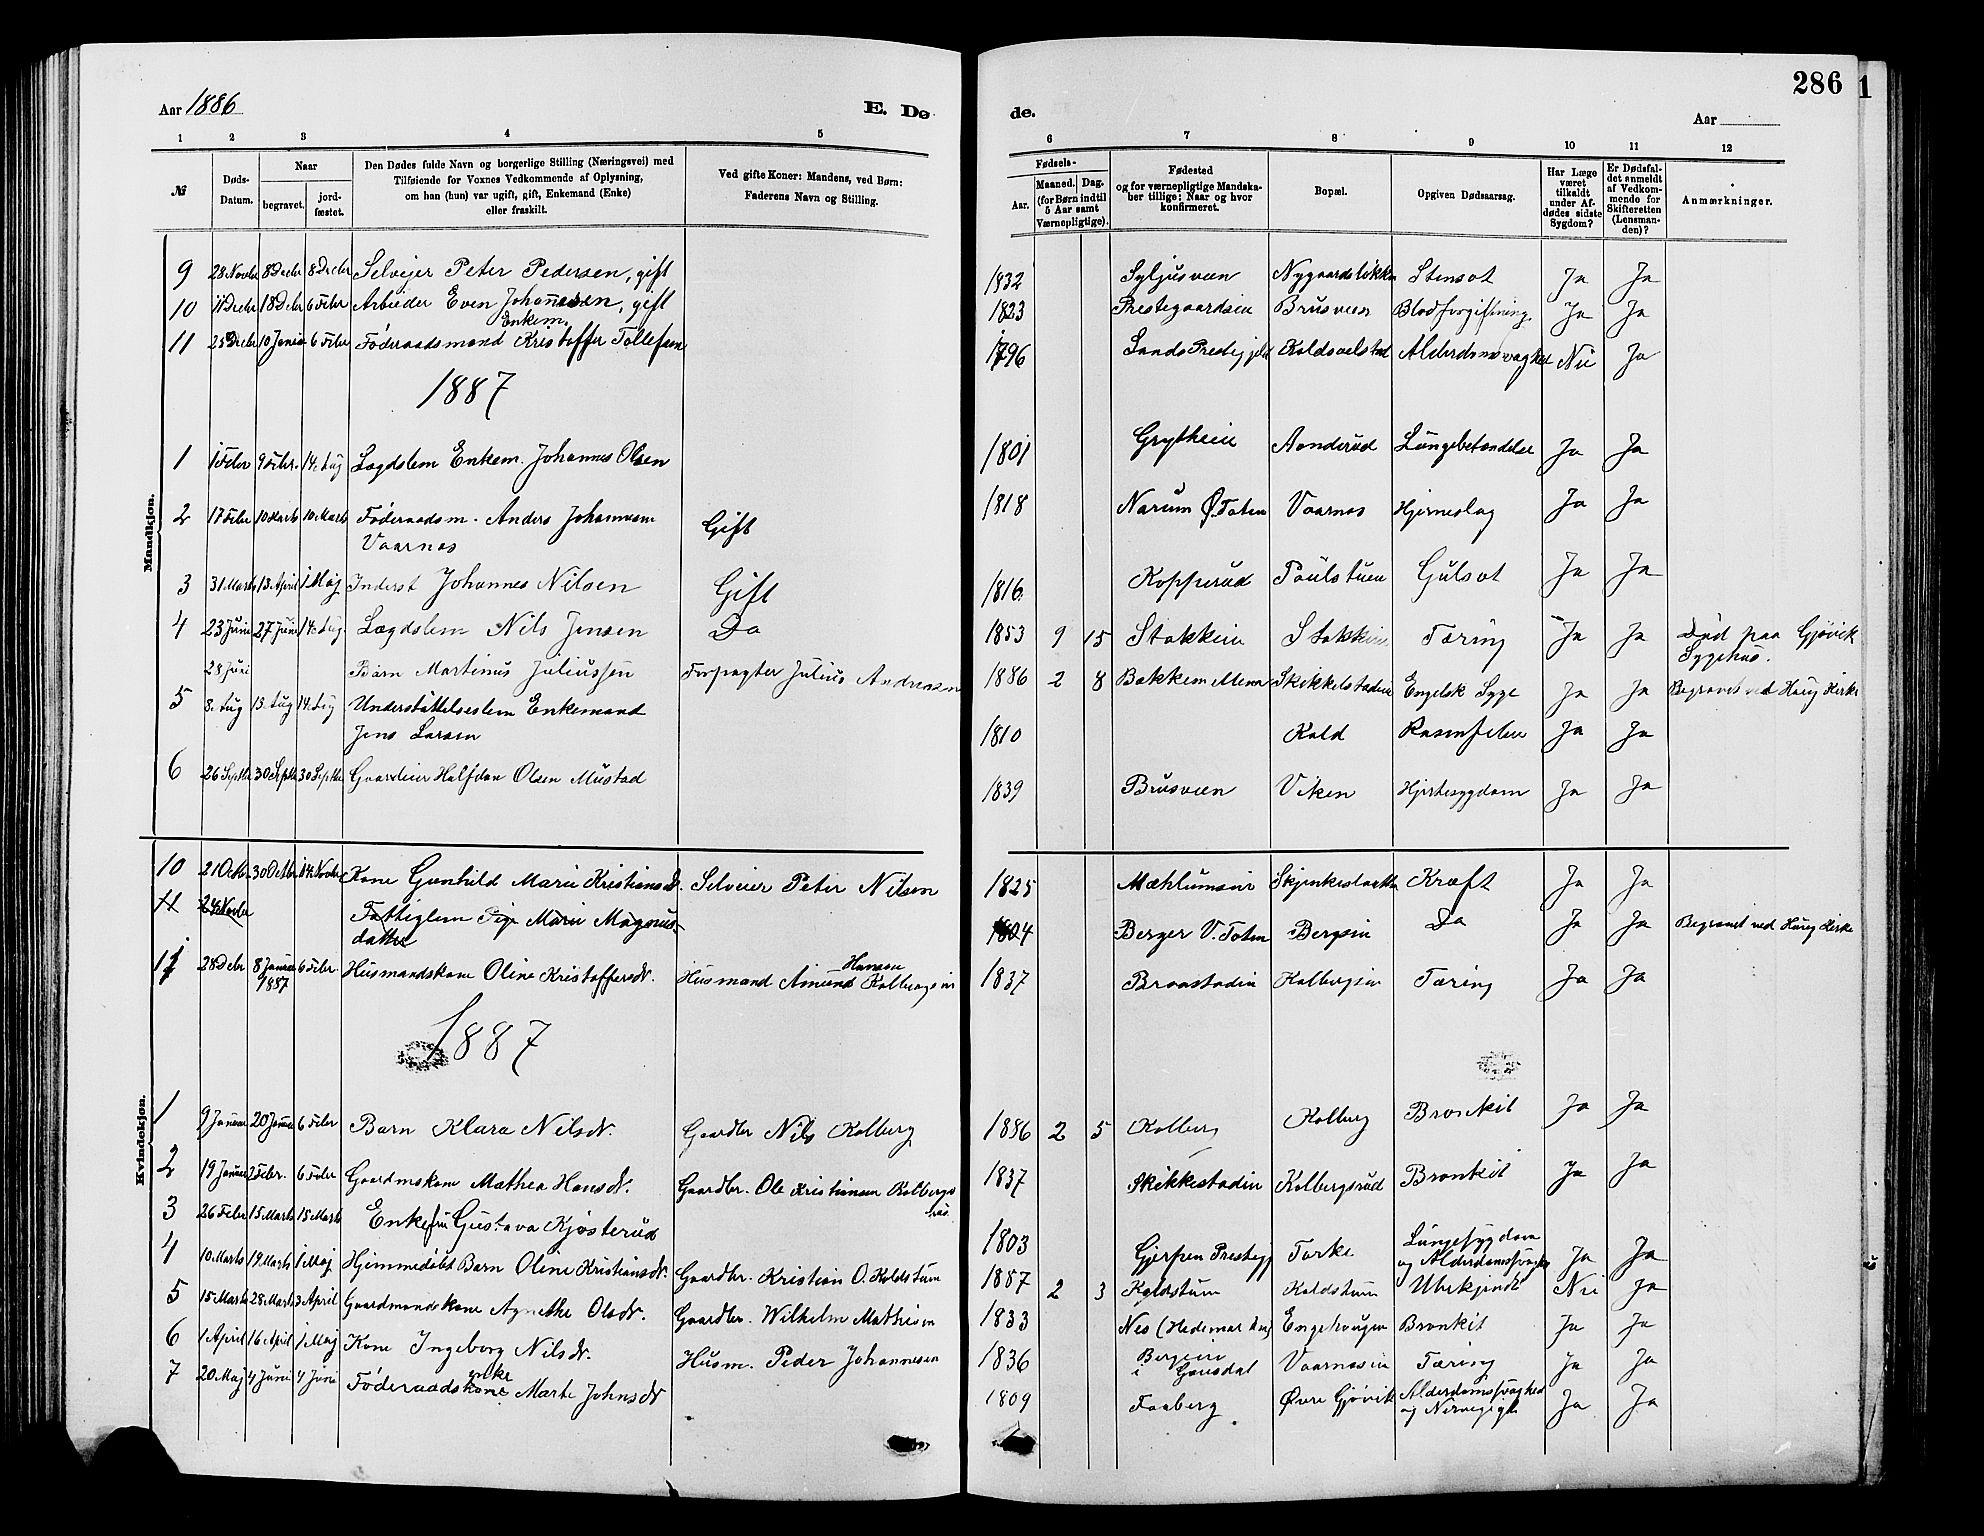 SAH, Vardal prestekontor, H/Ha/Hab/L0007: Klokkerbok nr. 7 /1, 1881-1895, s. 286